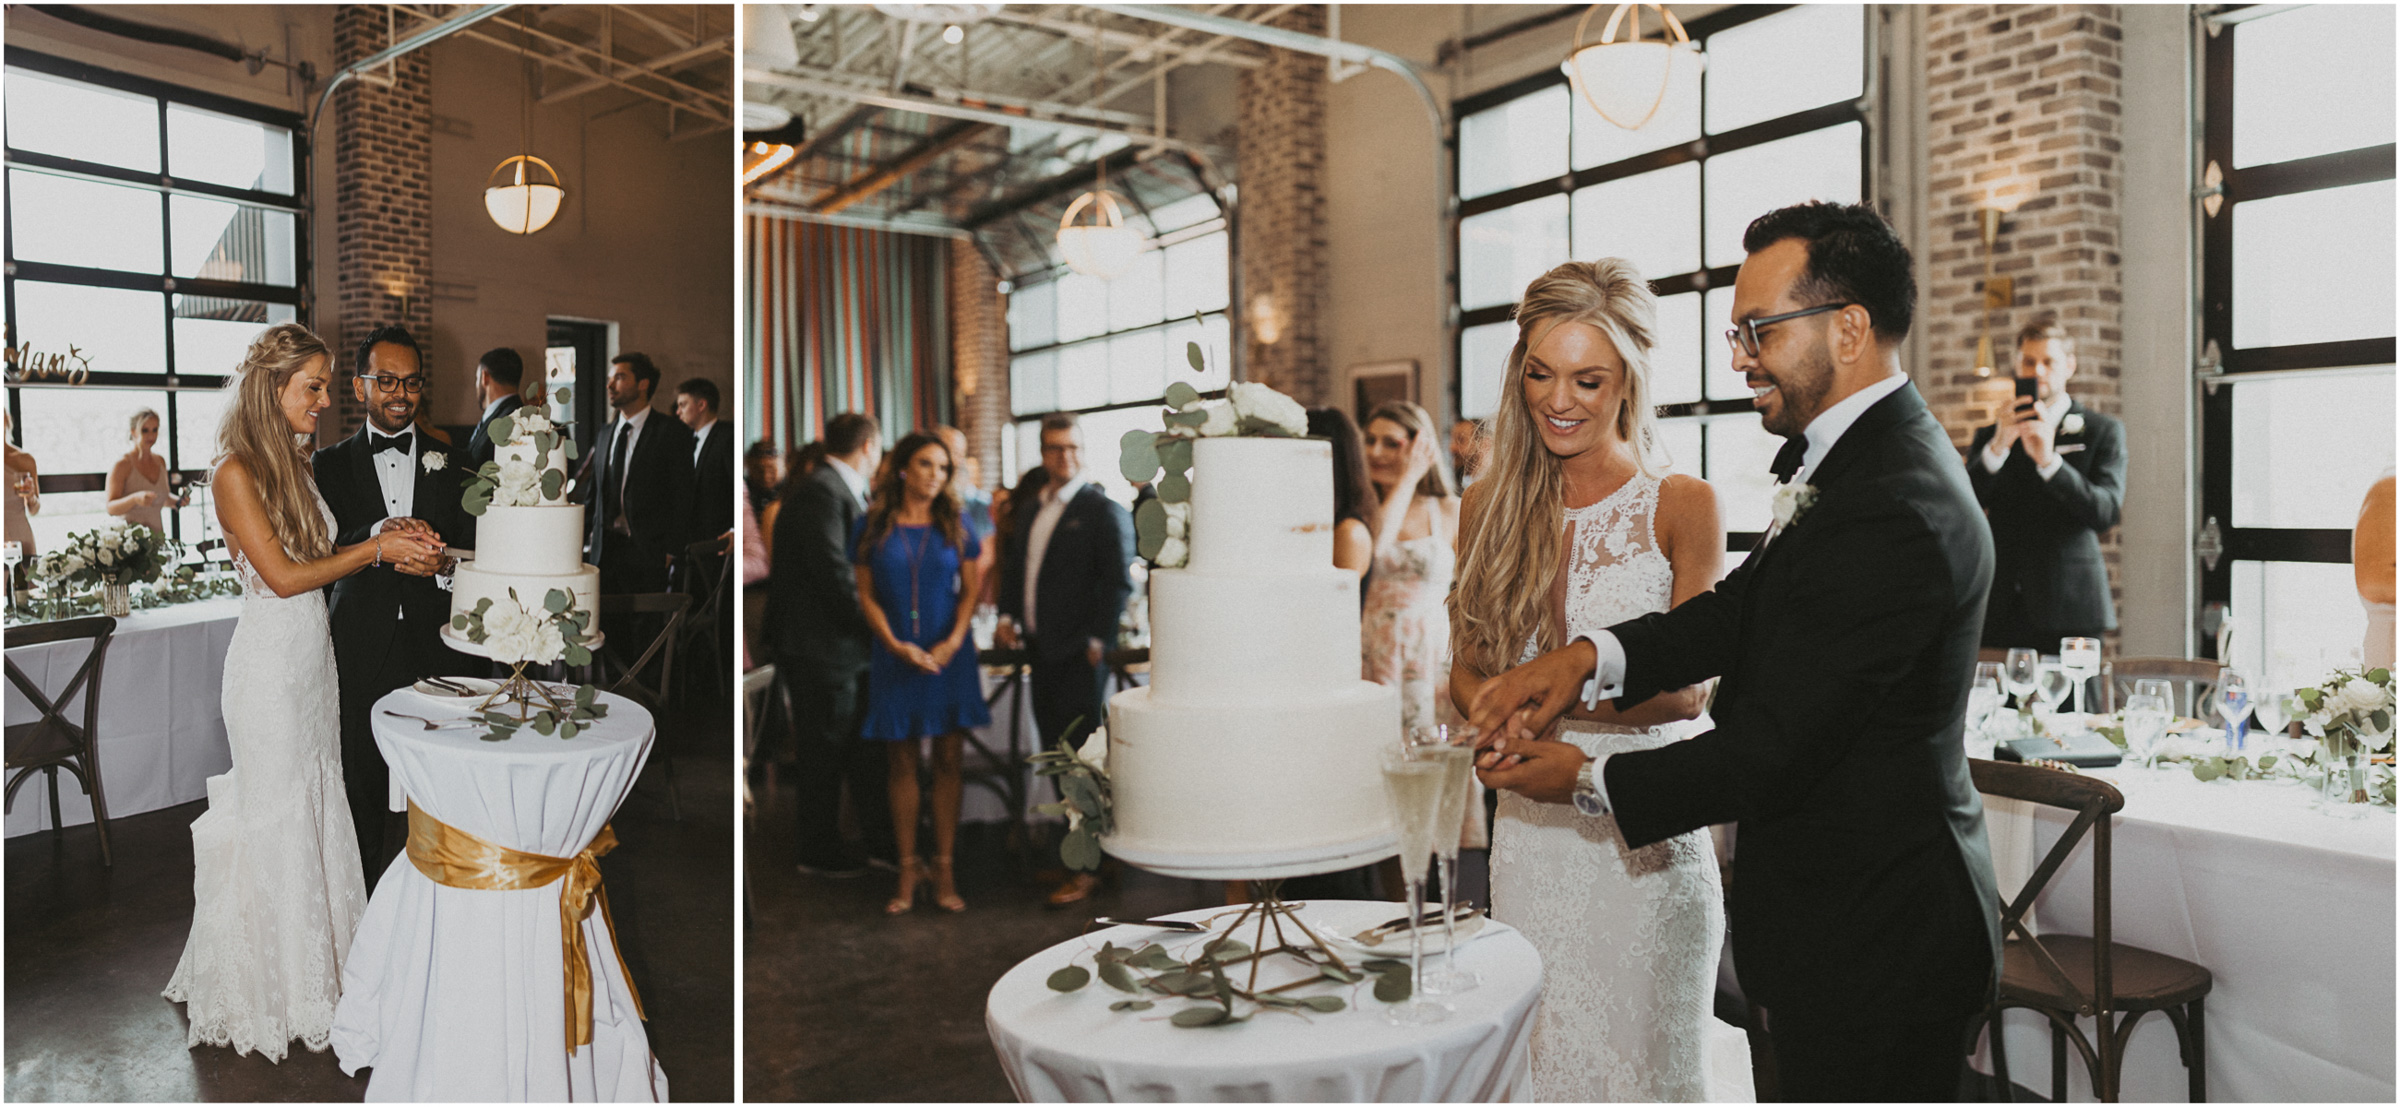 alyssa barletter photography downtown kansas city cherry hall summer wedding photographer-50.jpg